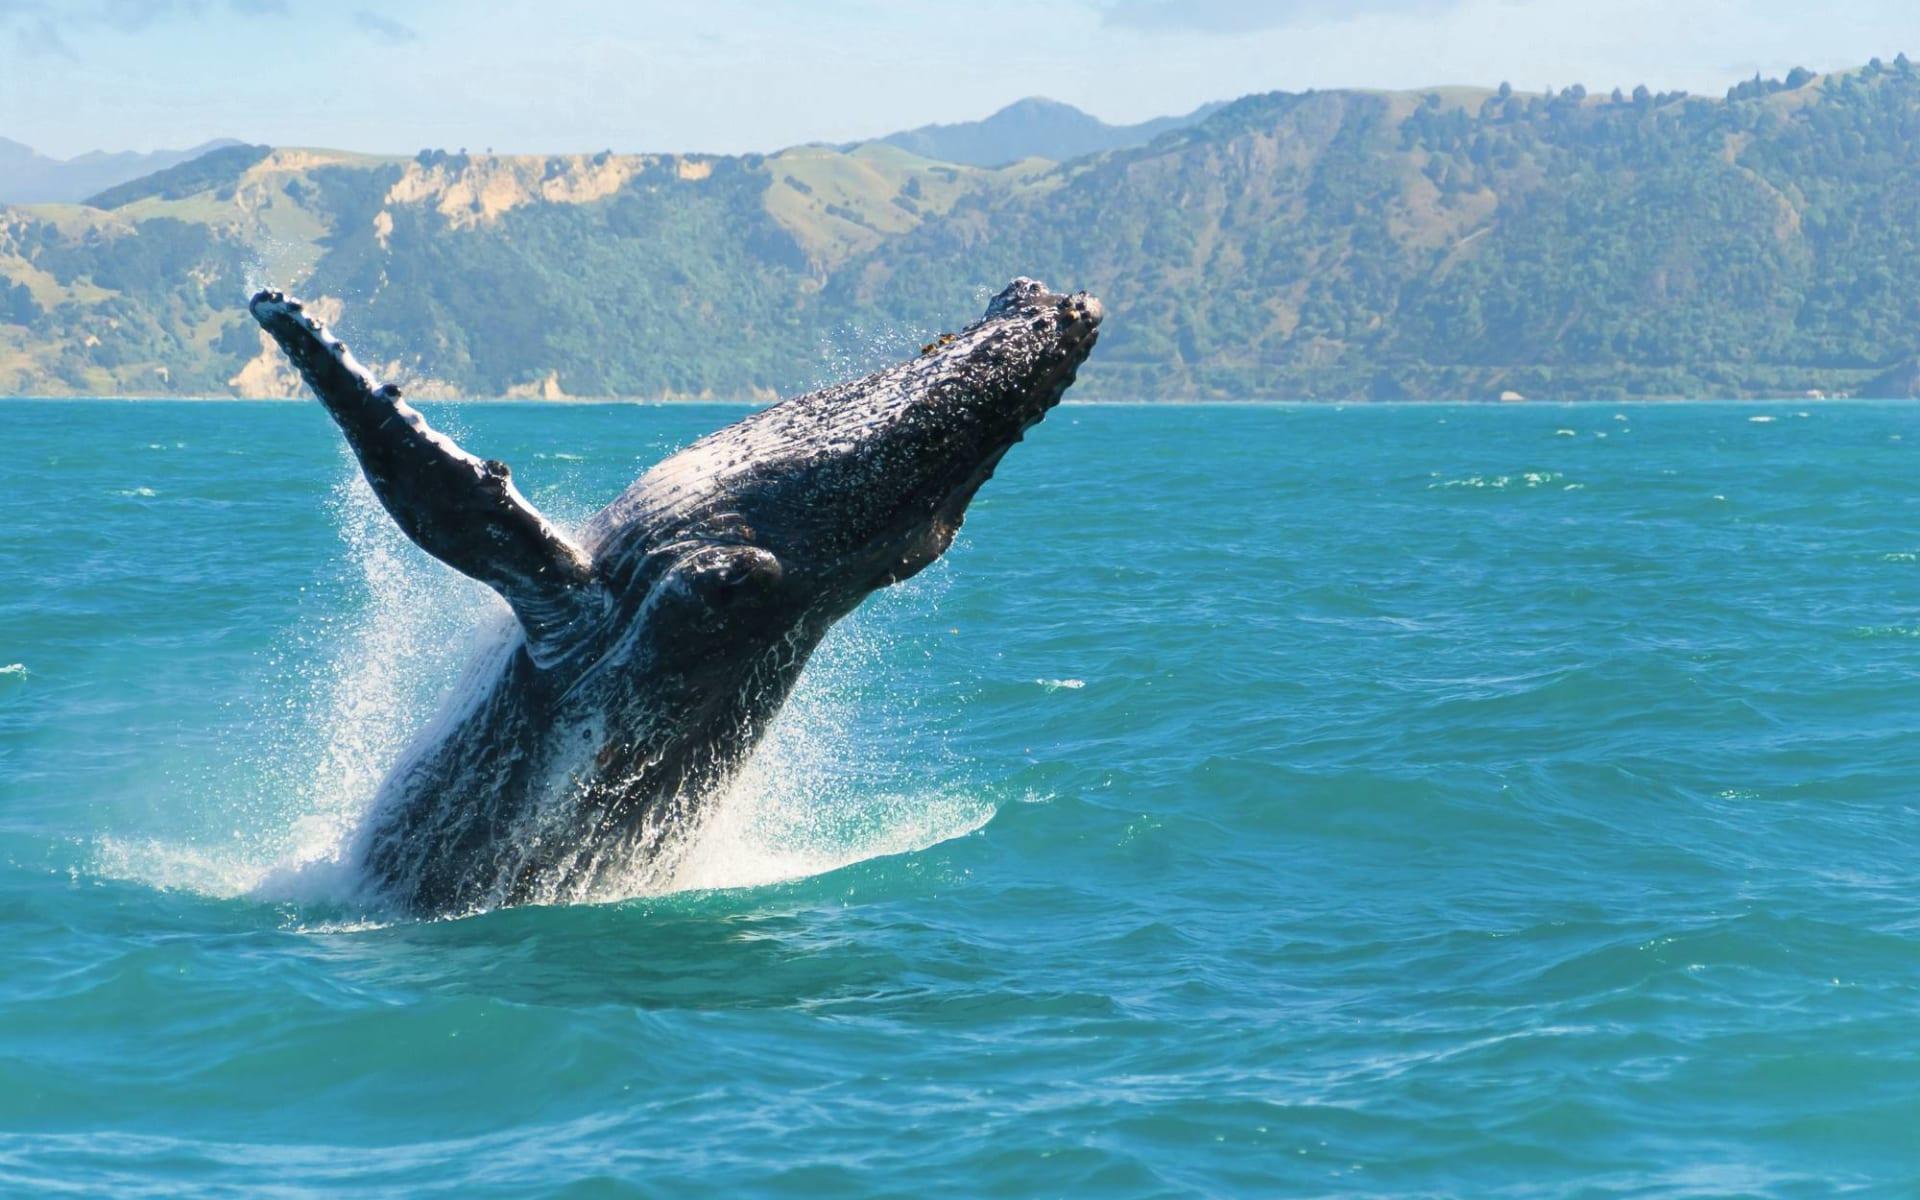 Kiwi Encounter ab Auckland: Neuseeland - Kaikoura Neuseeland - Whale Watch Tour Blick auf springenden Buckelwal  c shutterstock_86572033 2017